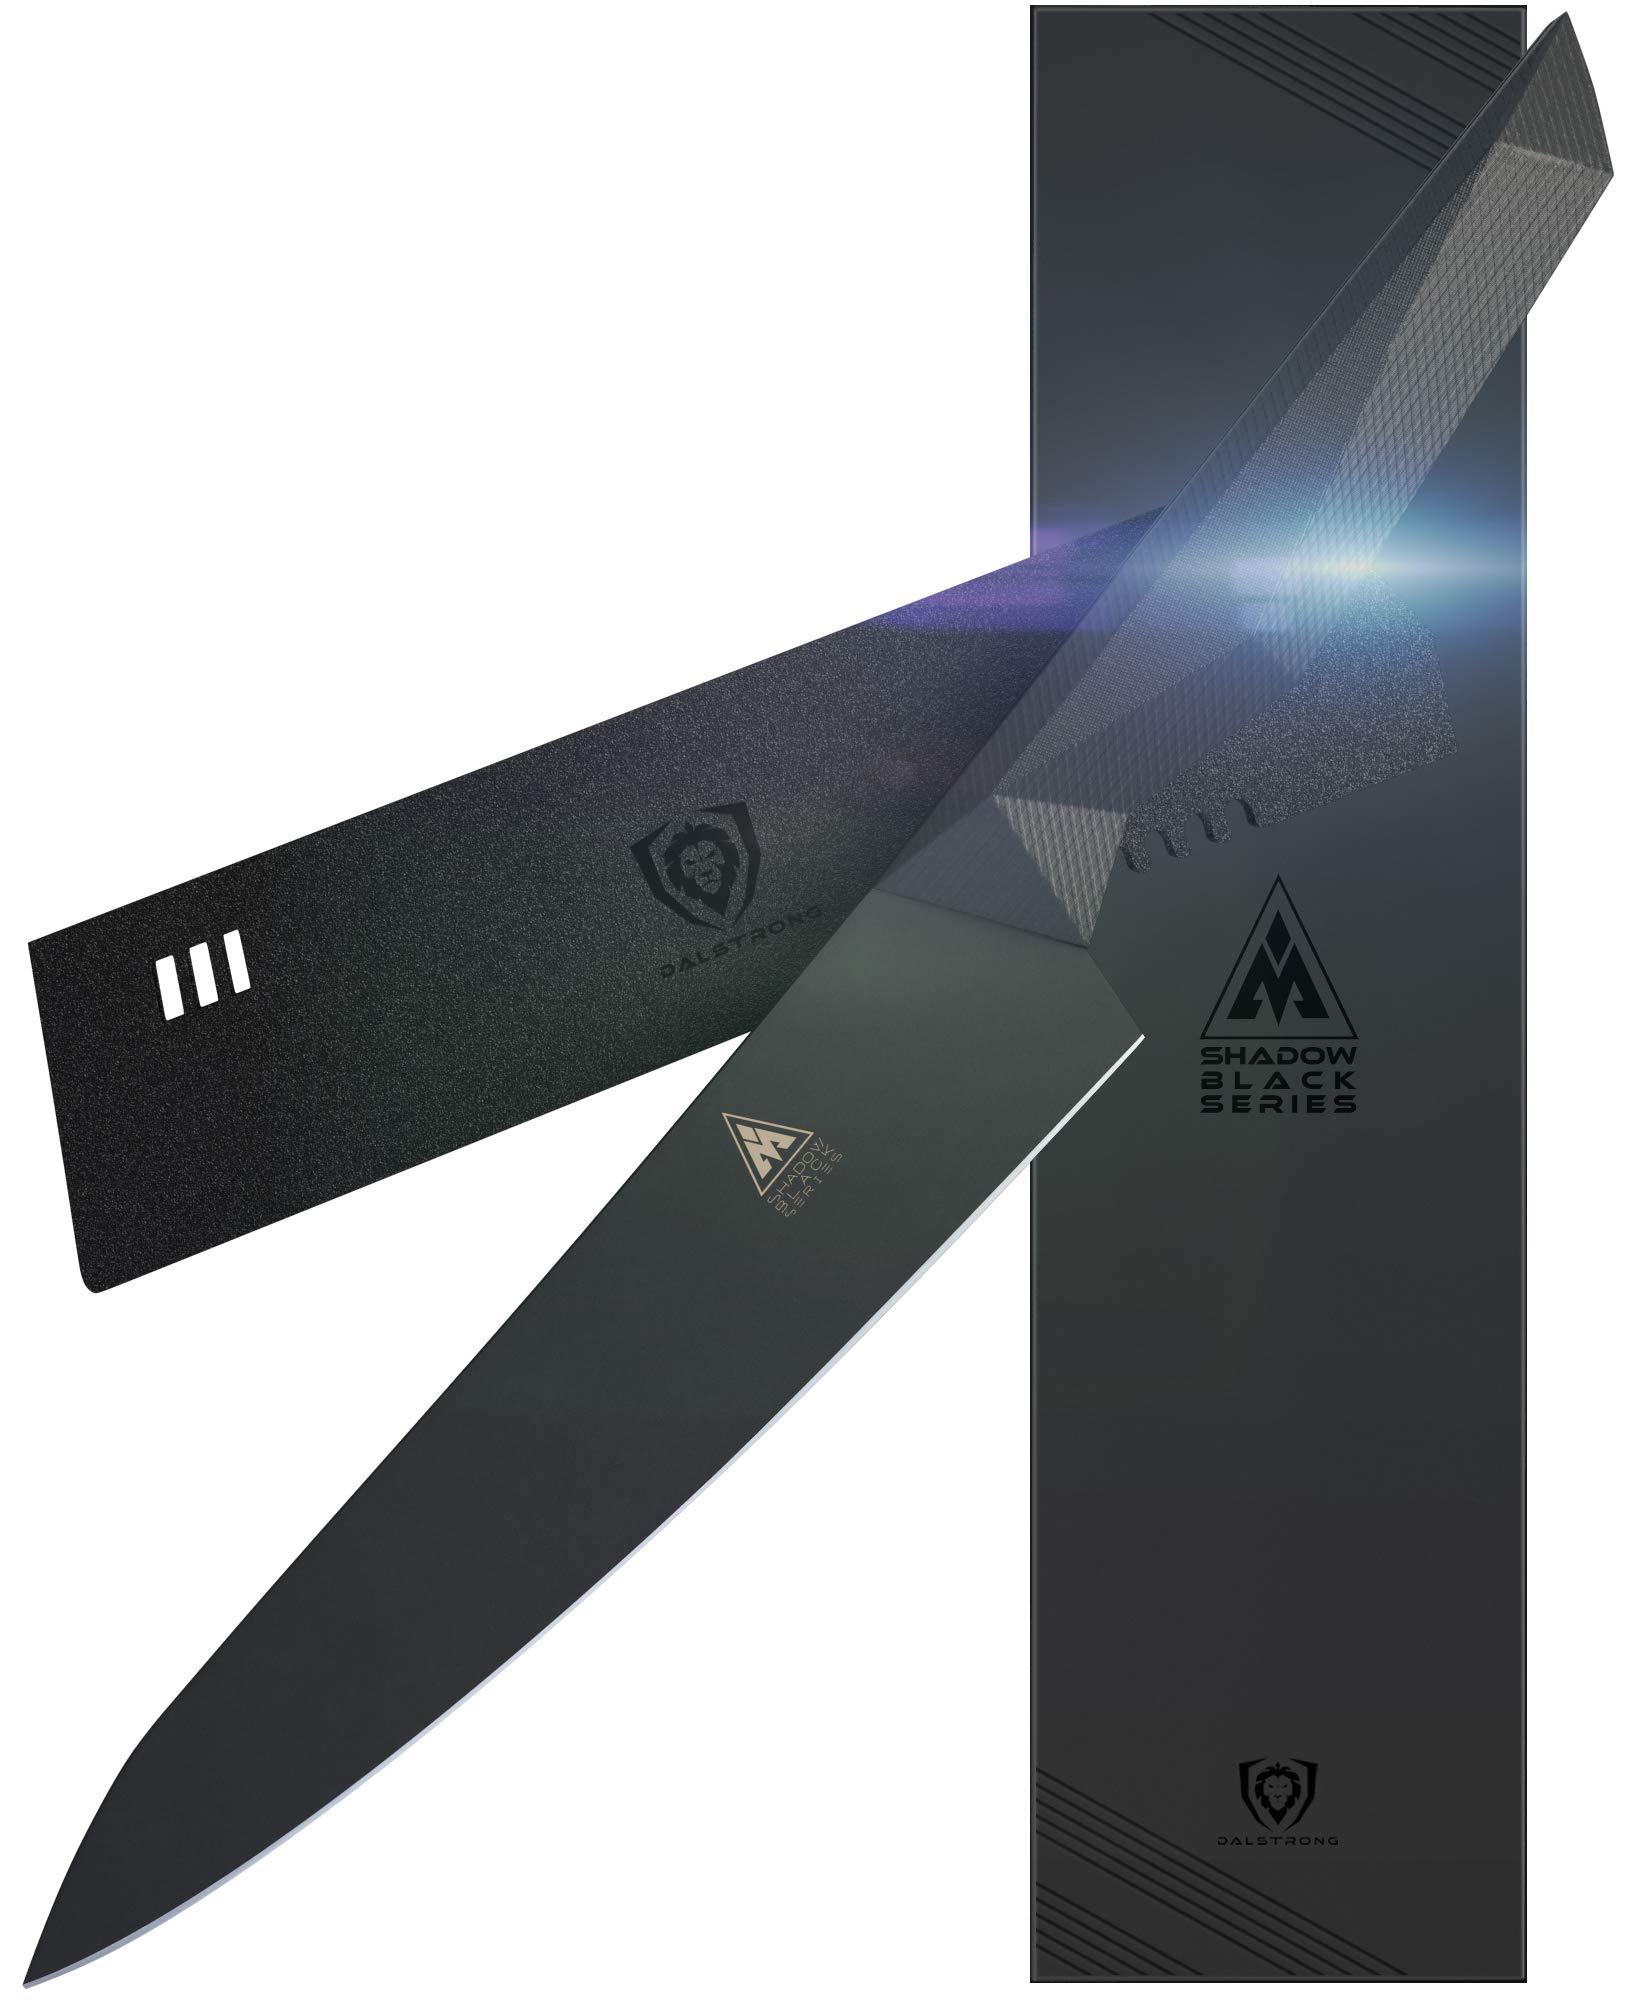 Dalstrong - Shadow Black Series - Black Titanium Nitride Coated - High Carbon - 7CR17MOV-X Vacuum Treated Steel- Sheath (8'' Chef)